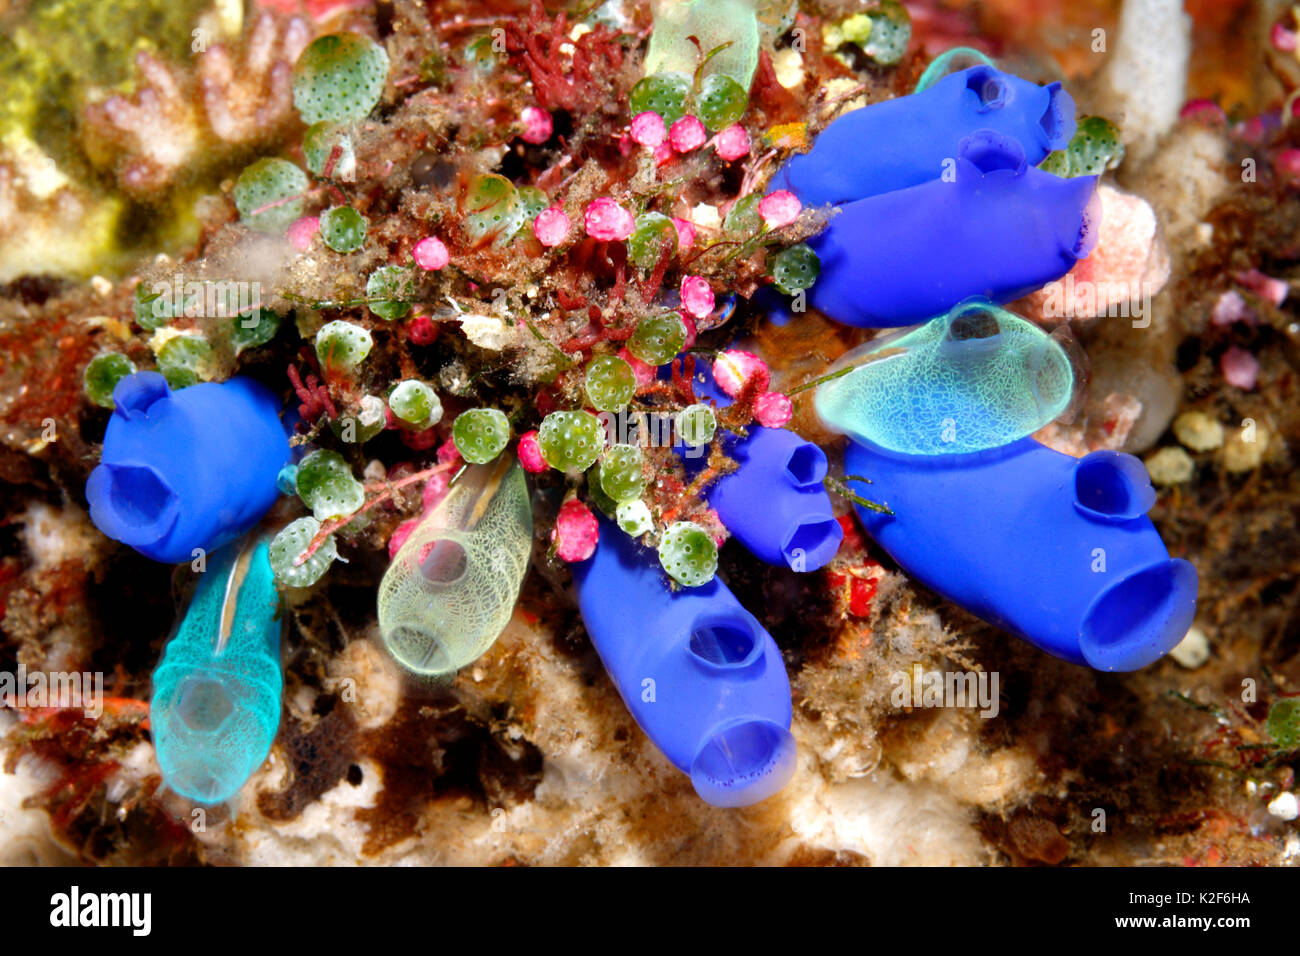 sea-squirts-tunicates-or-ascidians-rhopalaea-sp-didemnum-molle-didemnum-K2F6HA.jpg